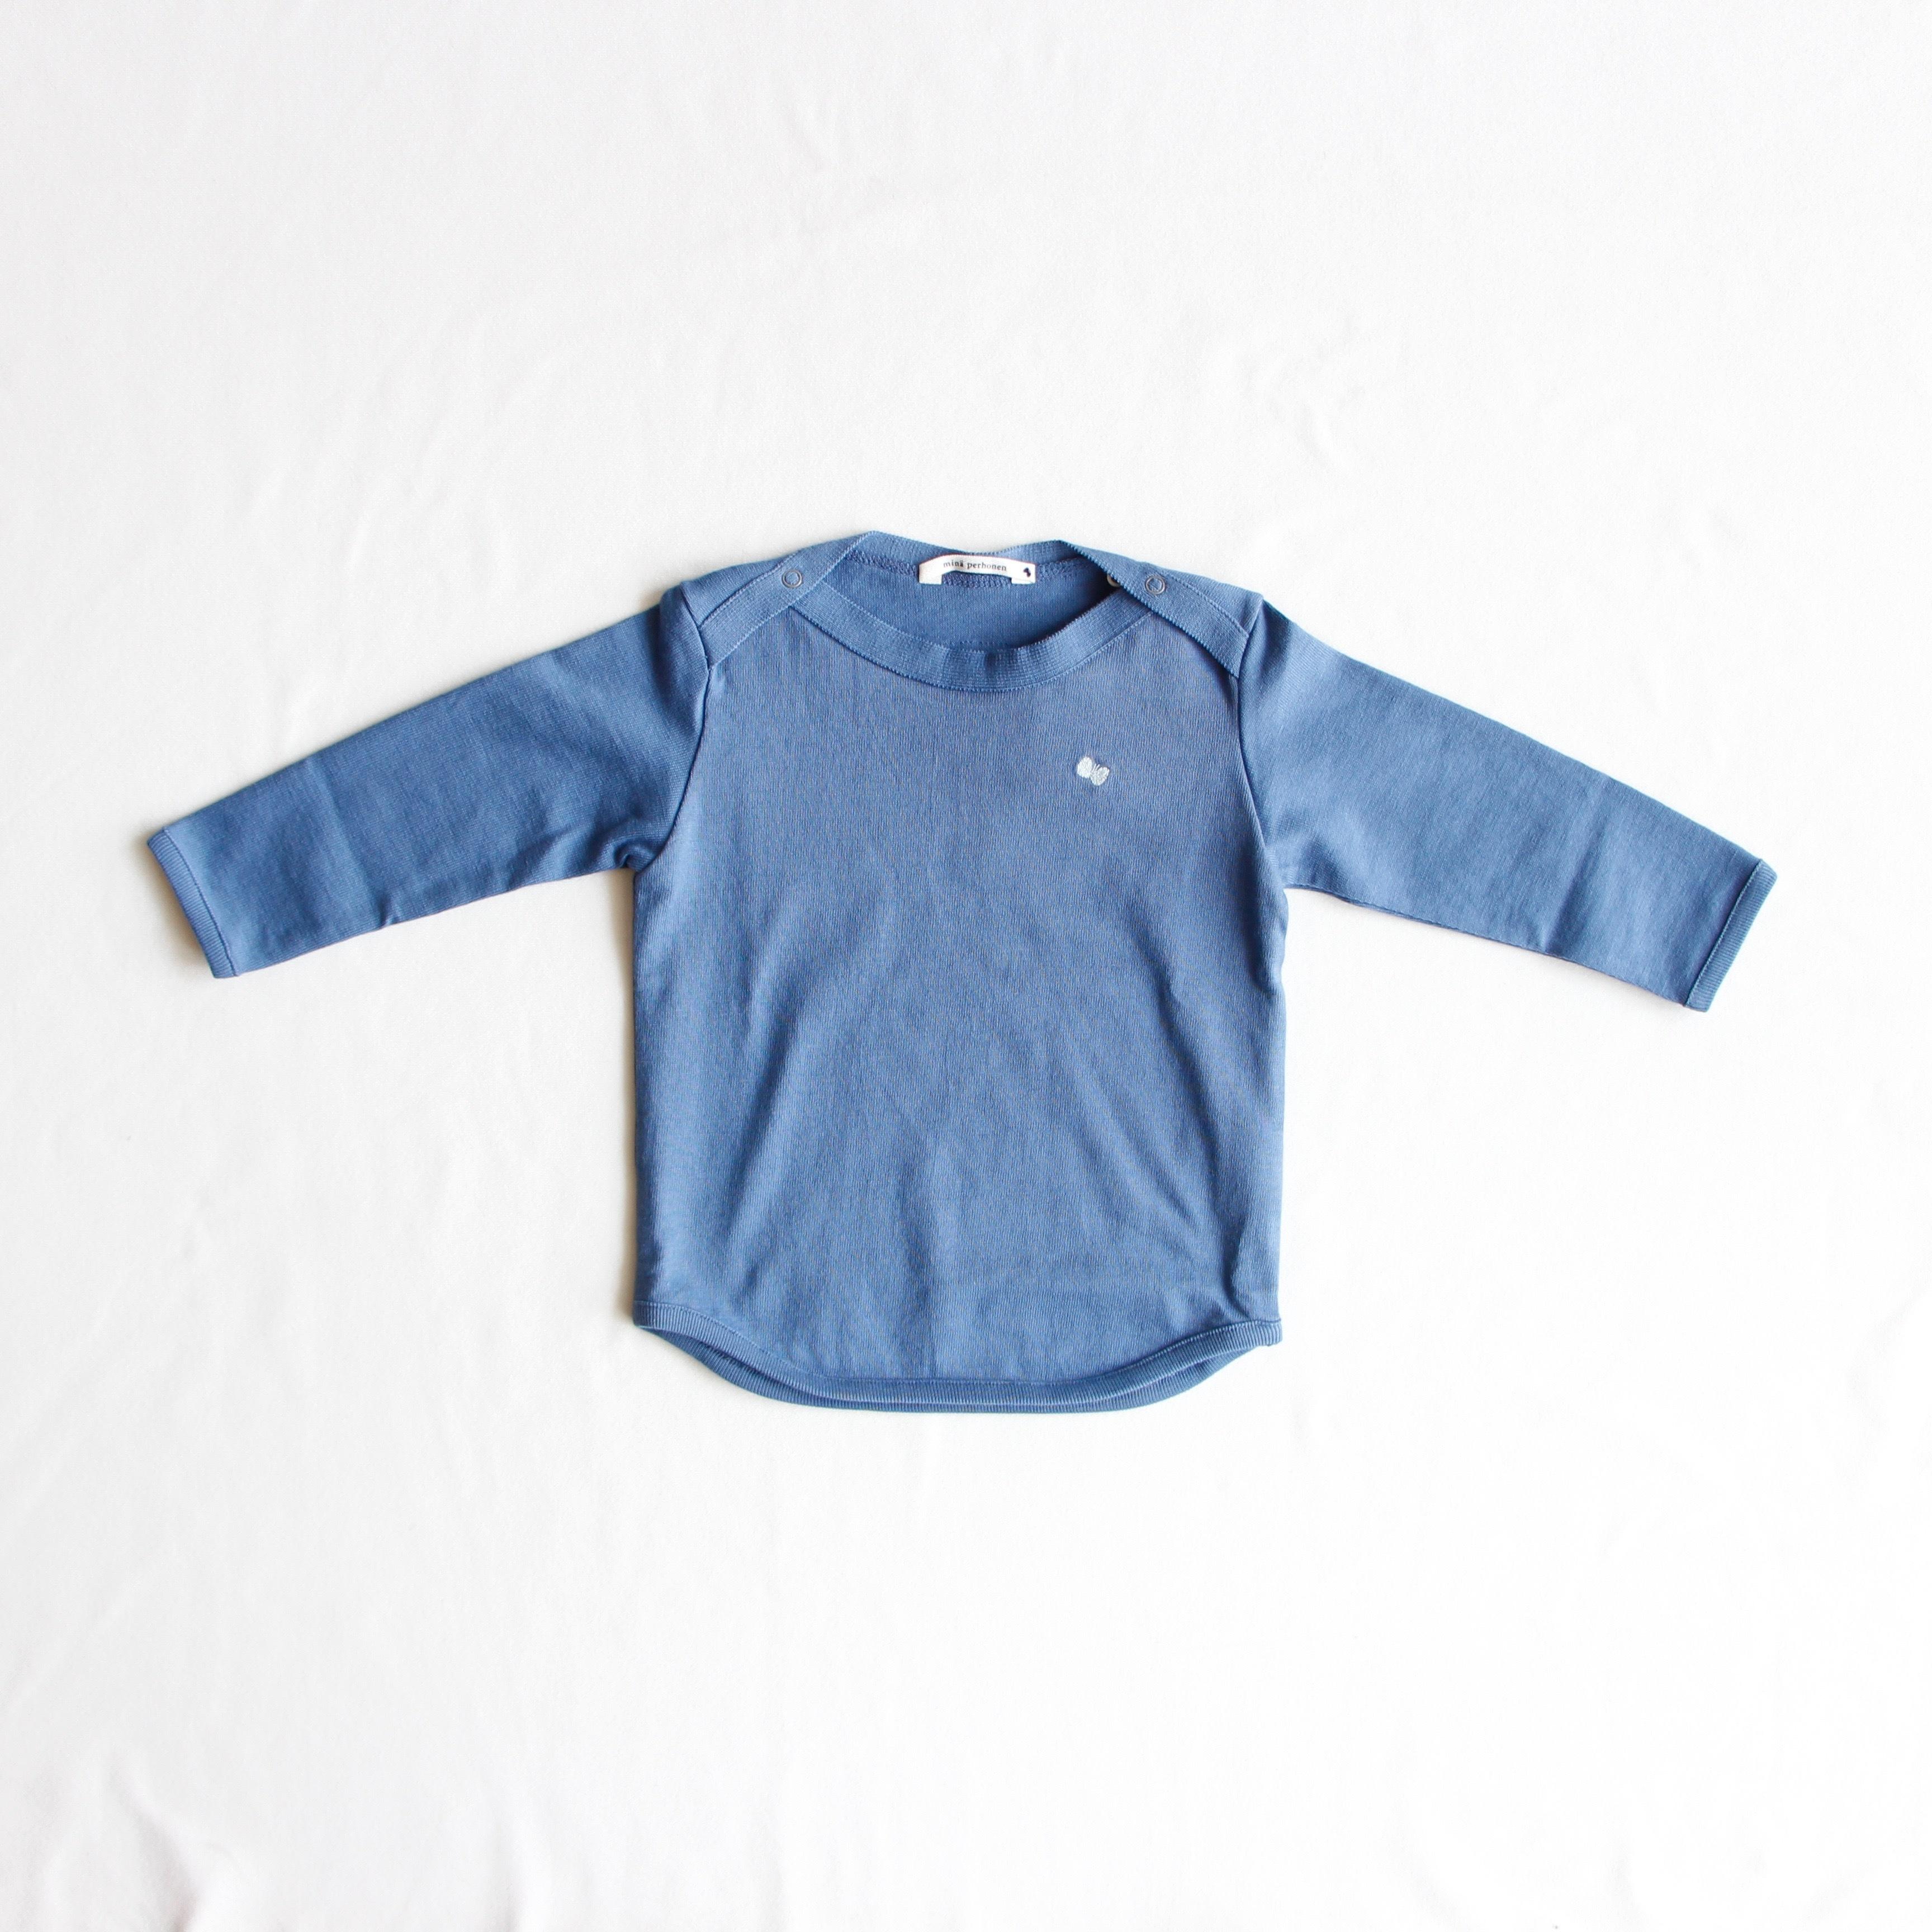 《mina perhonen 2018AW》zutto 長袖カットソー / blue / 110cm